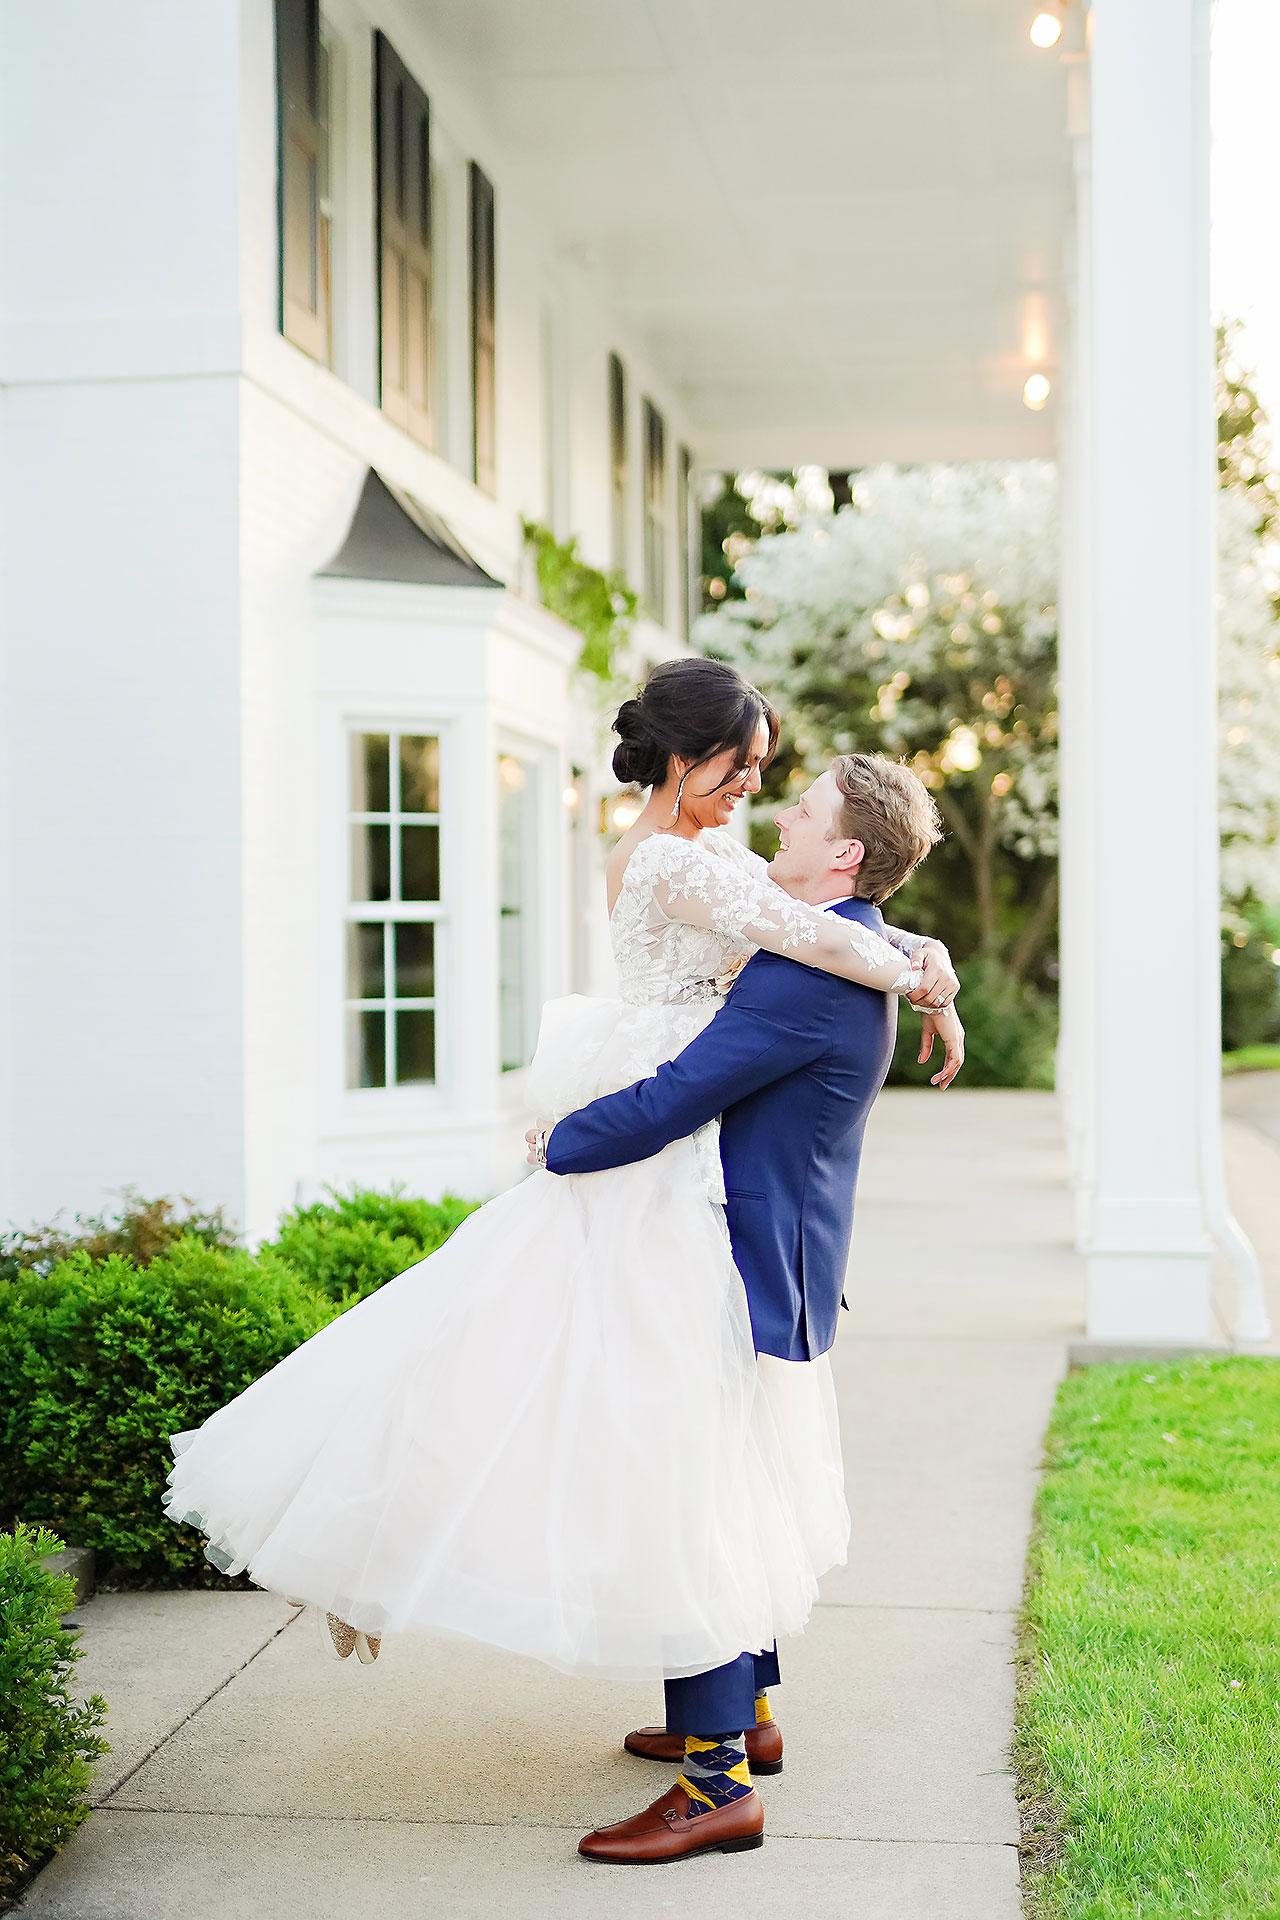 Nadia Parker Black Iris Estate Carmel Indiana Wedding May 2021 280